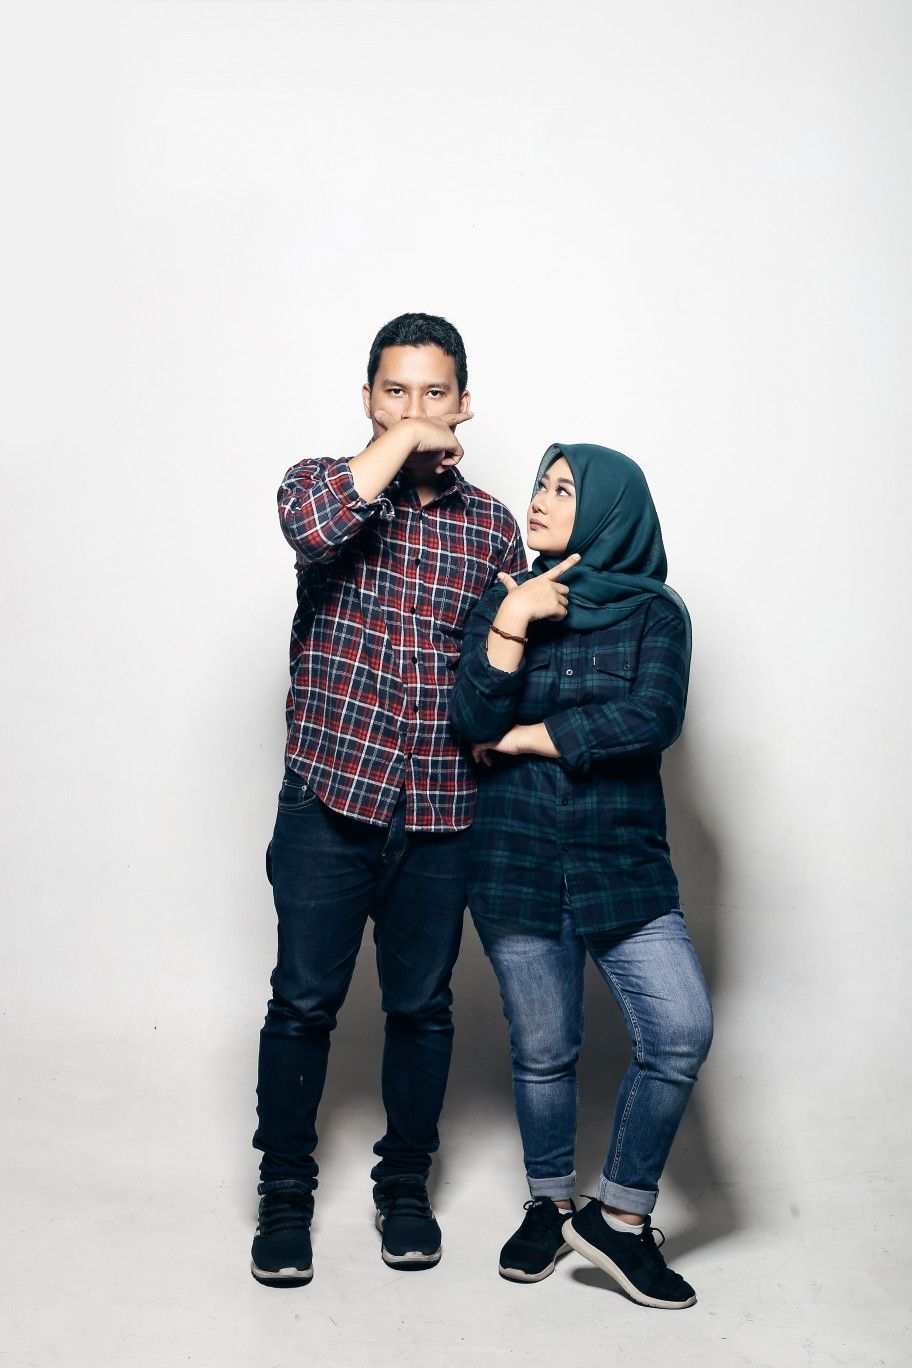 Hijab Couple Casual Prewedding Studio Photoshoot In Flanel Shirt Kaos Foto Pernikahan Lucu Foto Tunangan